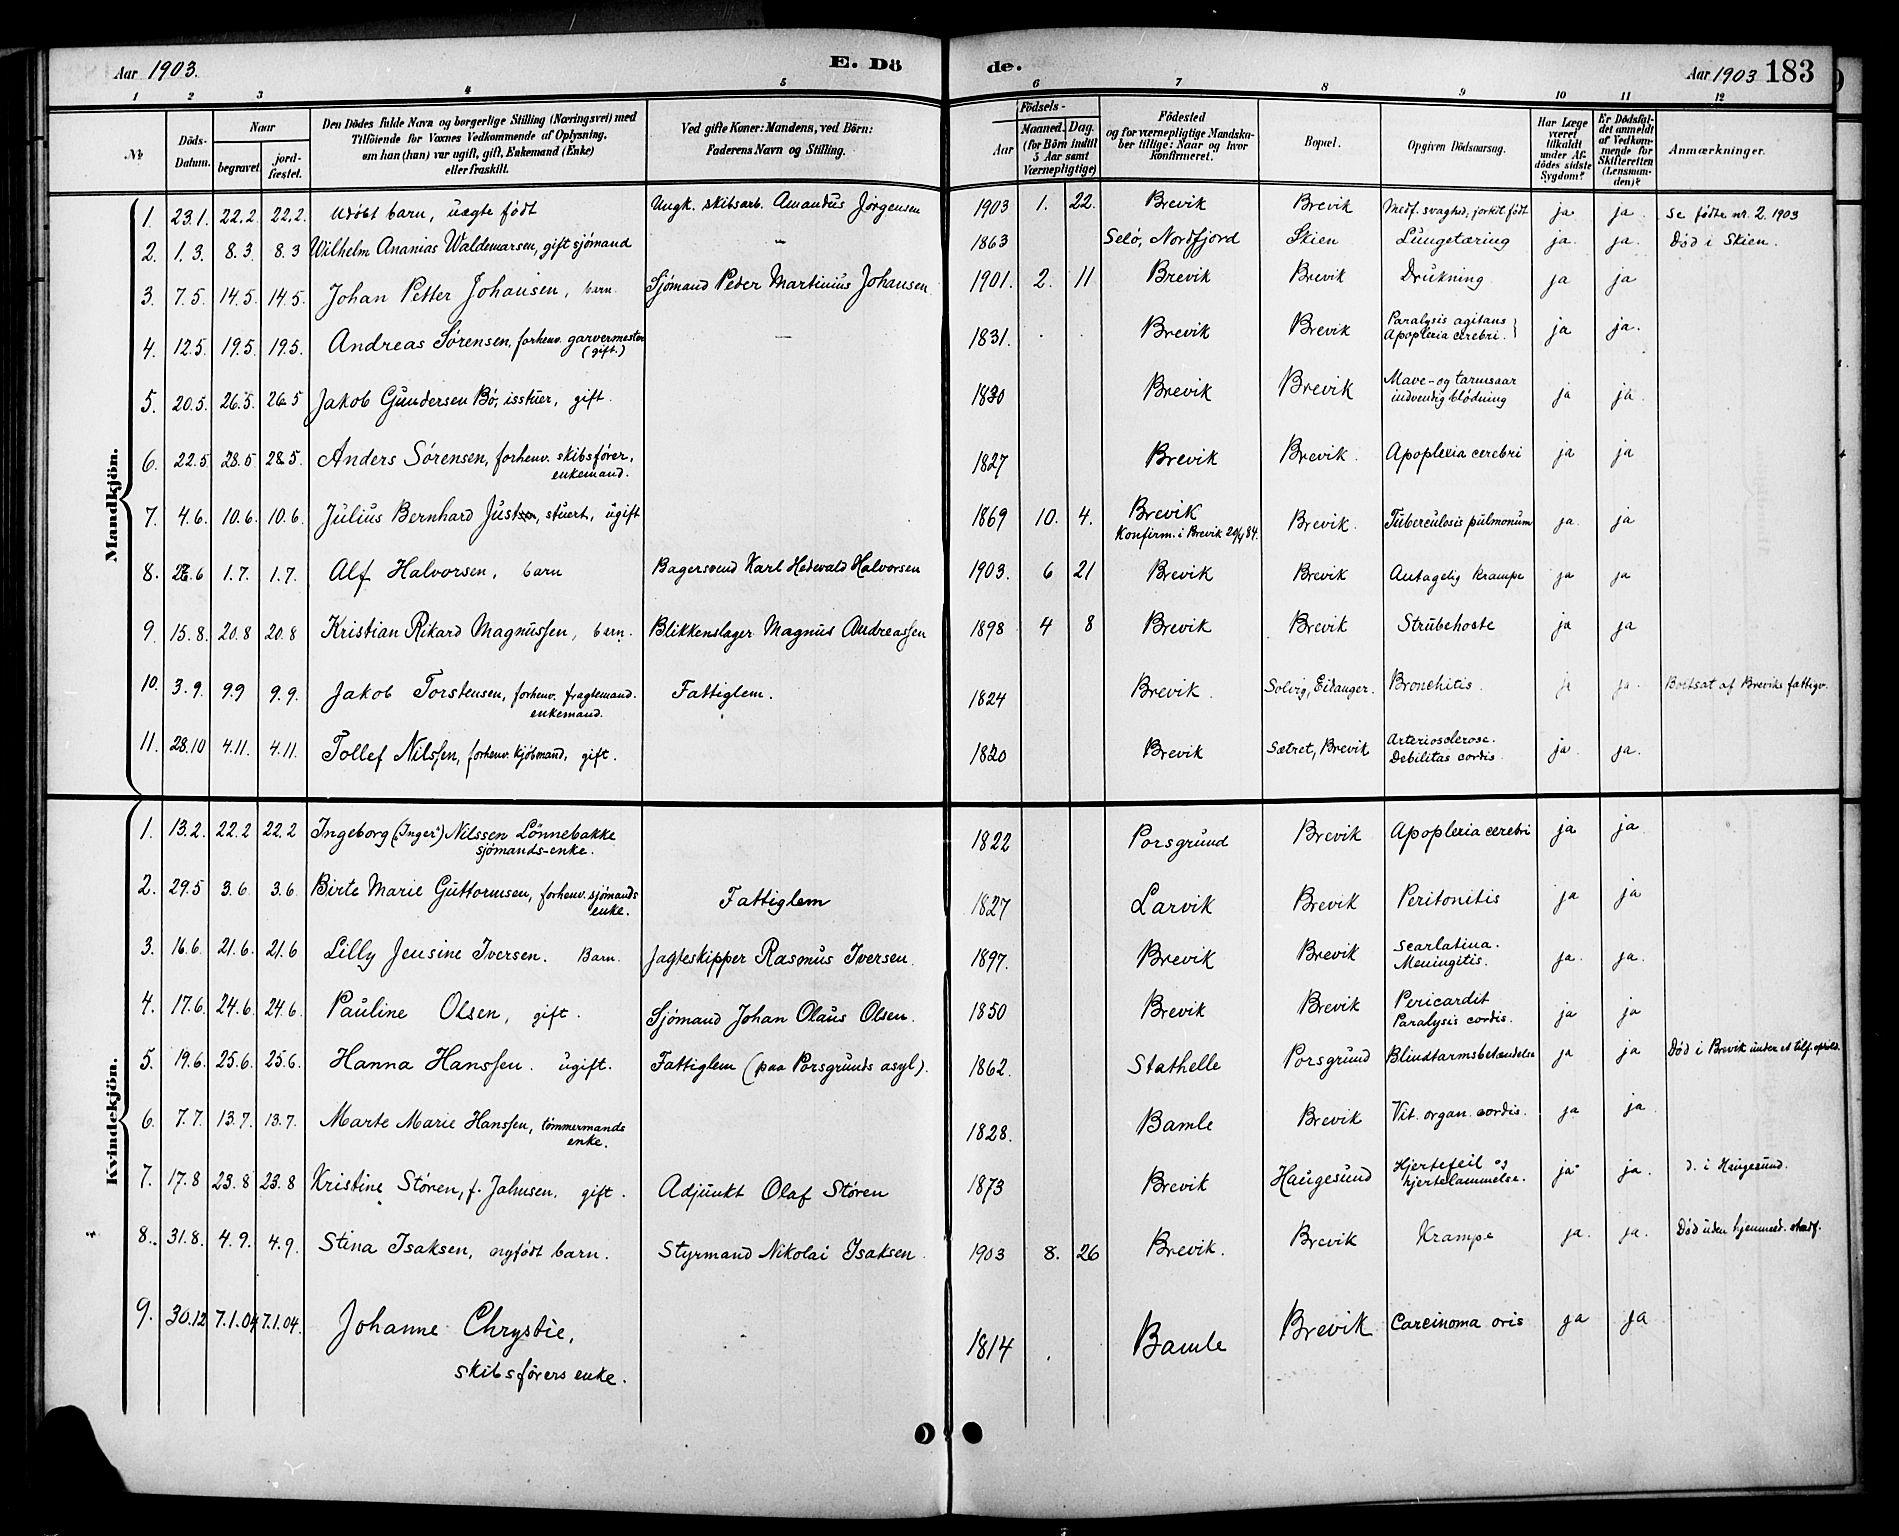 SAKO, Brevik kirkebøker, G/Ga/L0005: Klokkerbok nr. 5, 1901-1924, s. 183